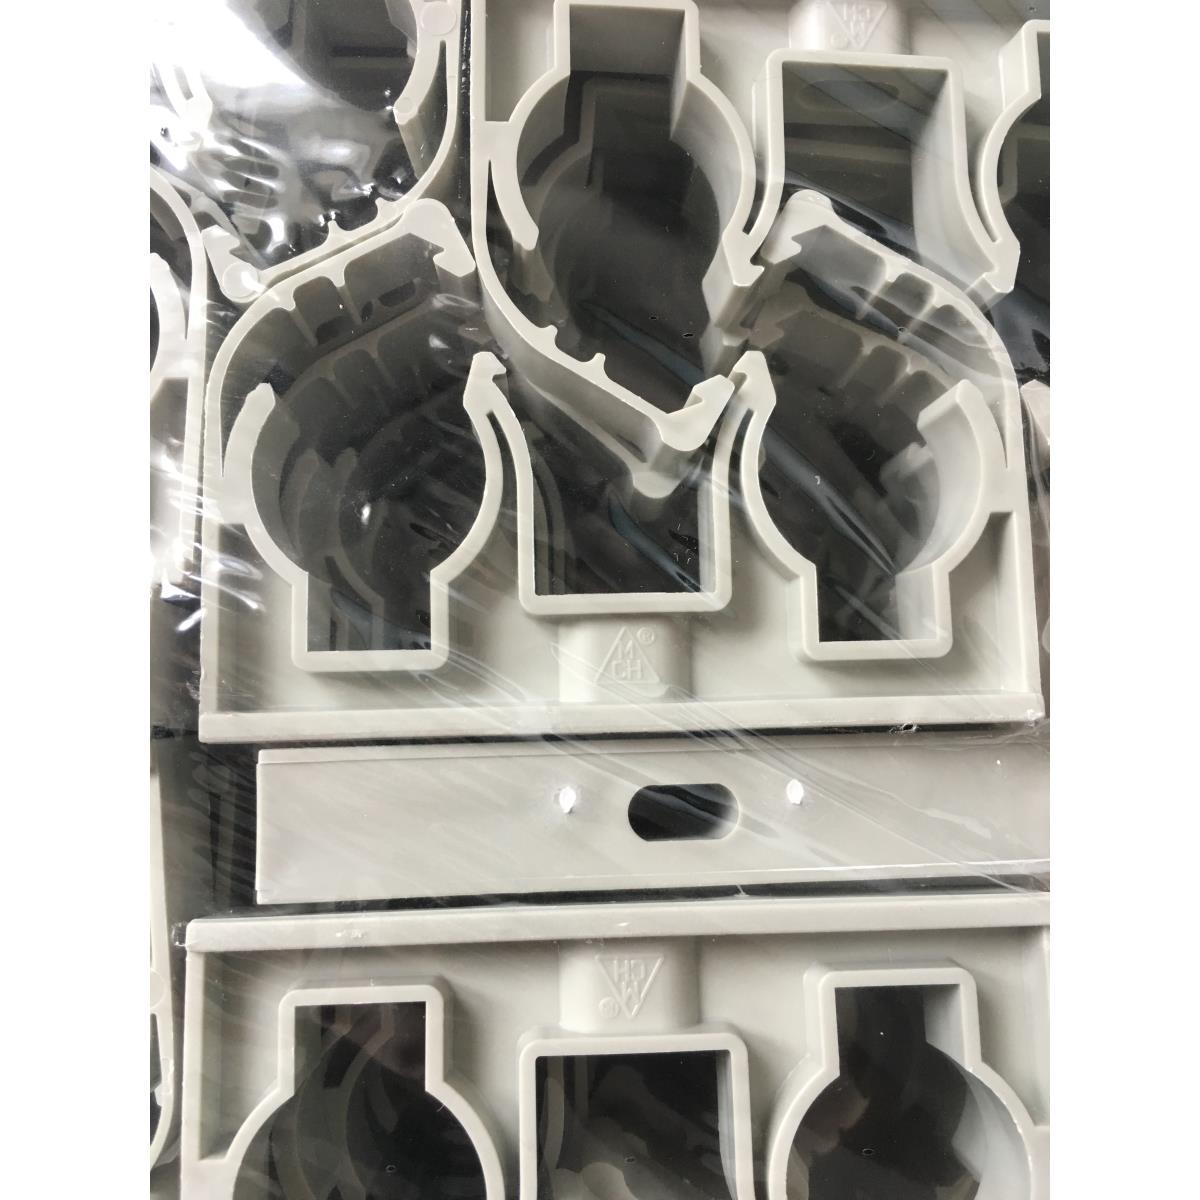 150 x Rohrclips doppelt  2 x 25 mm Rohrbefestigung Rohrschelle Rohrhalter Clip